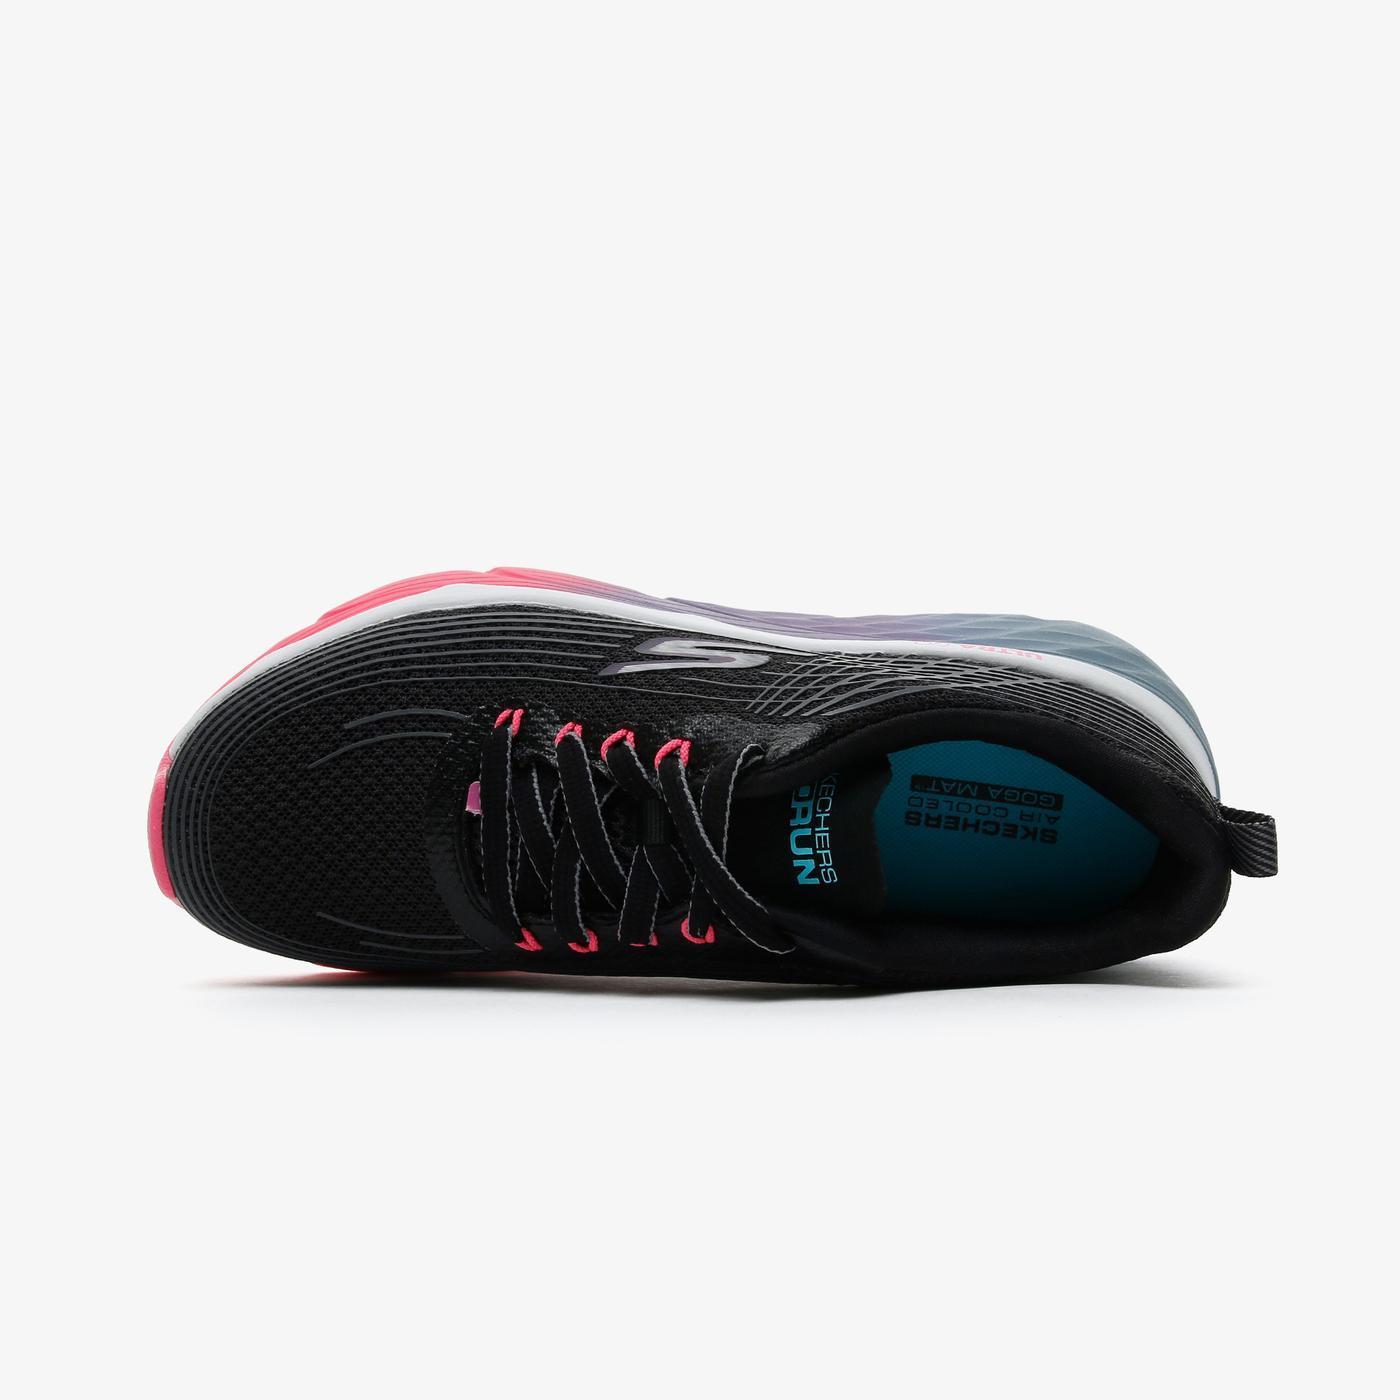 Skechers Max Cushioning Elite - Prism Kadın Siyah Spor Ayakkabı